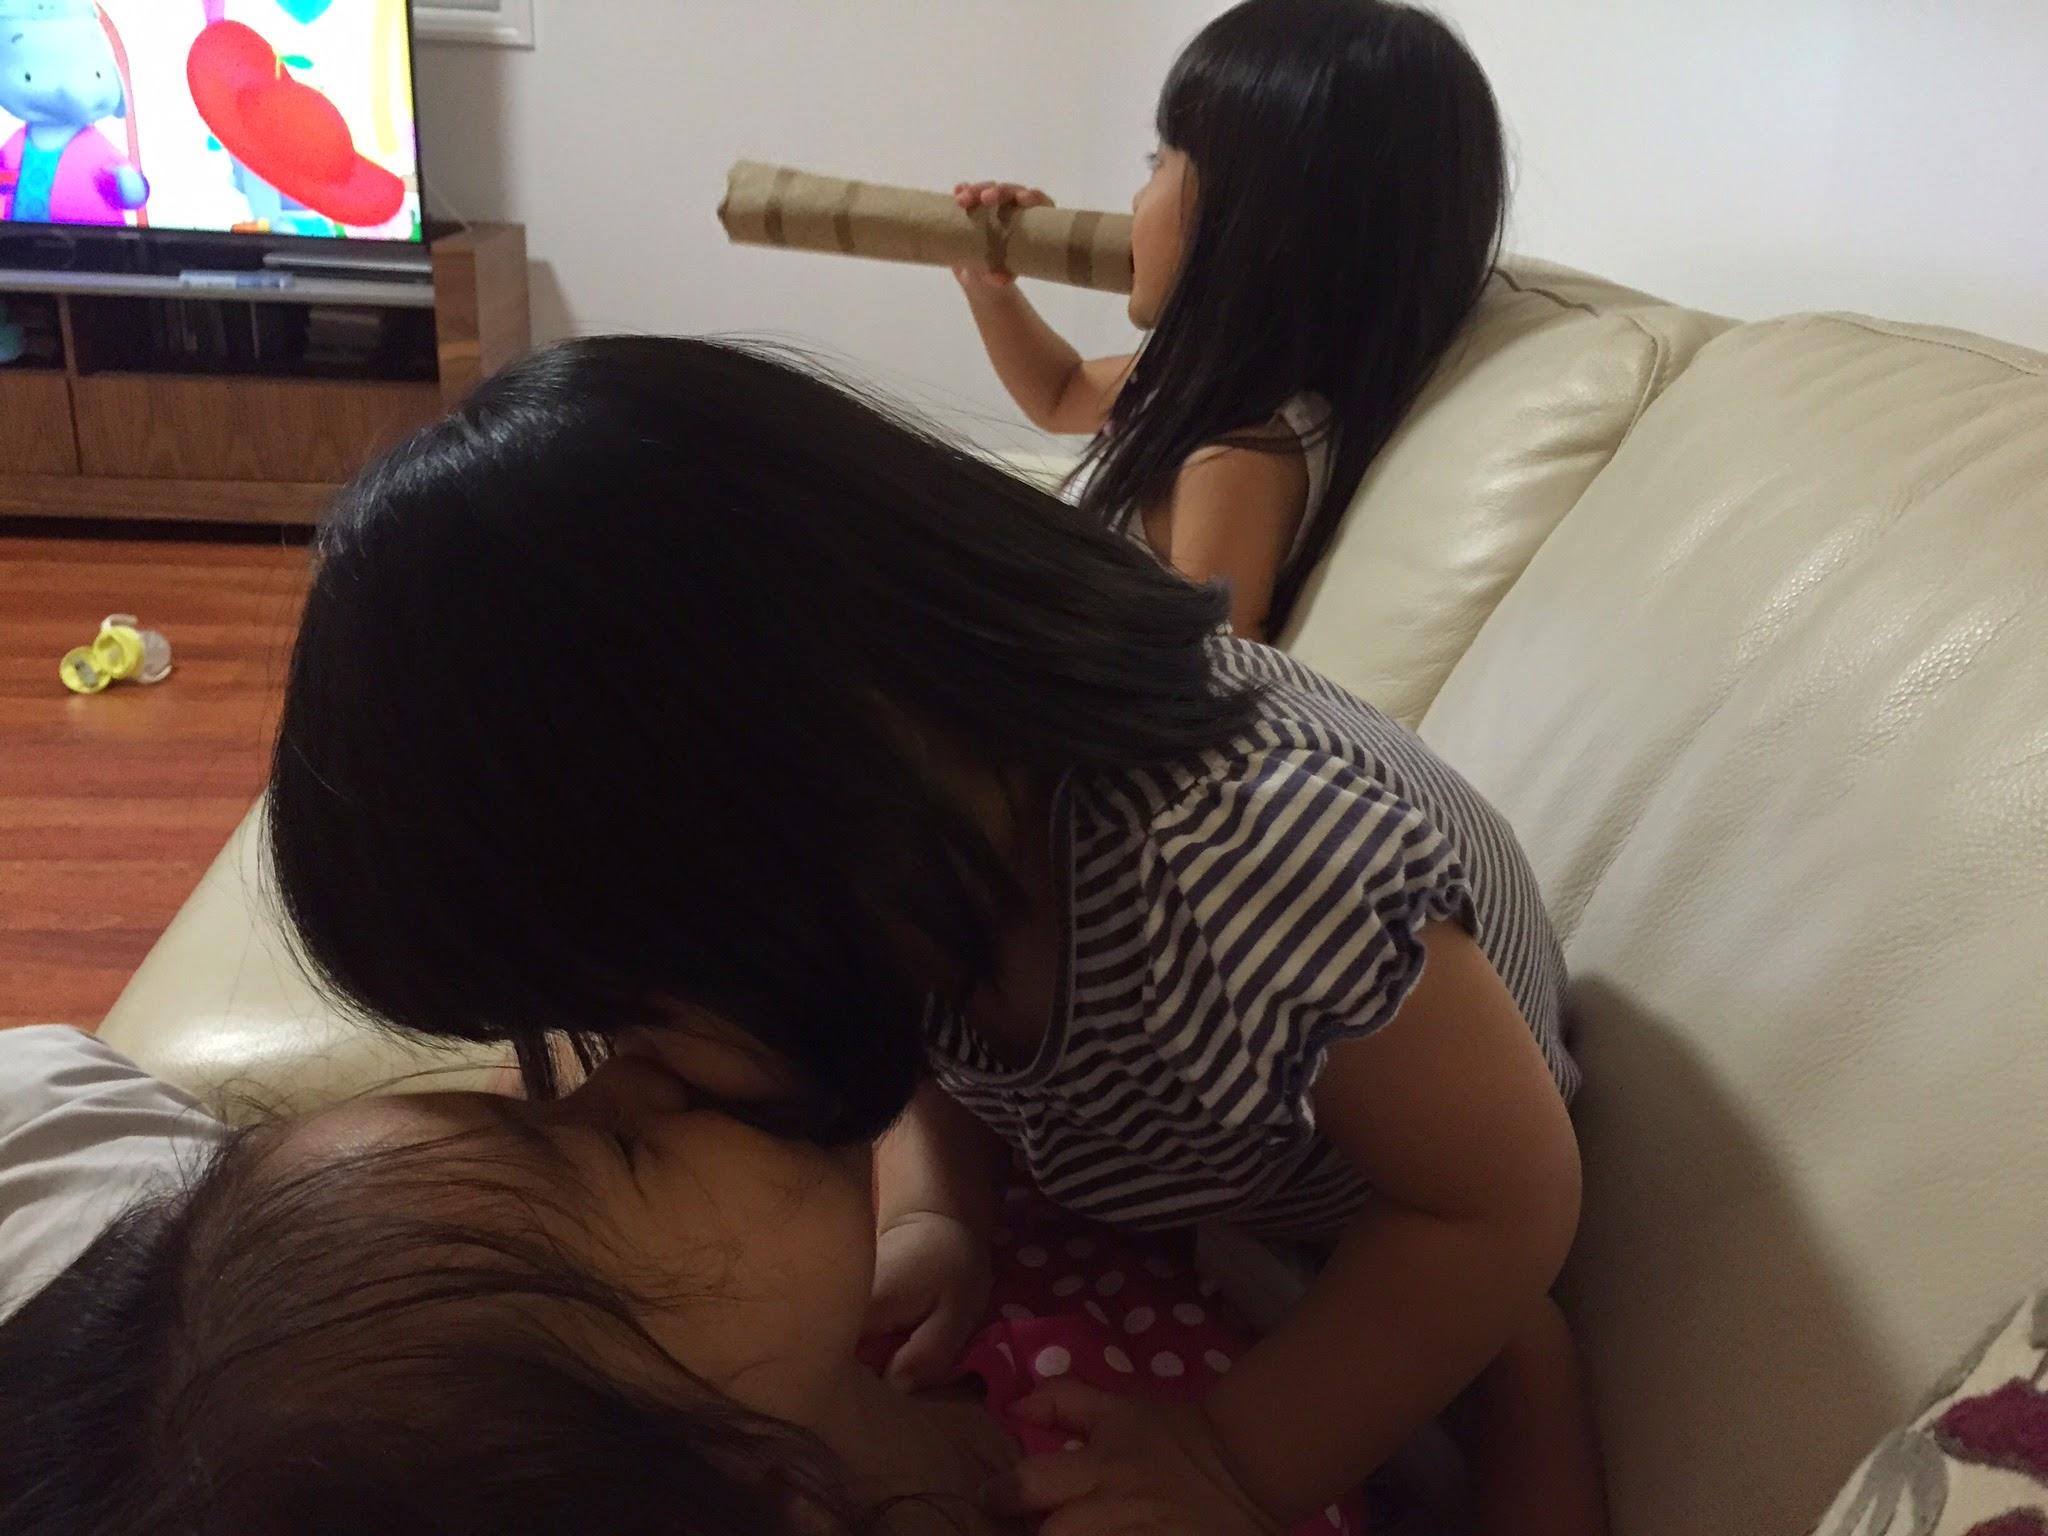 幼女スレ [無断転載禁止]©2ch.netYouTube動画>19本 ->画像>998枚